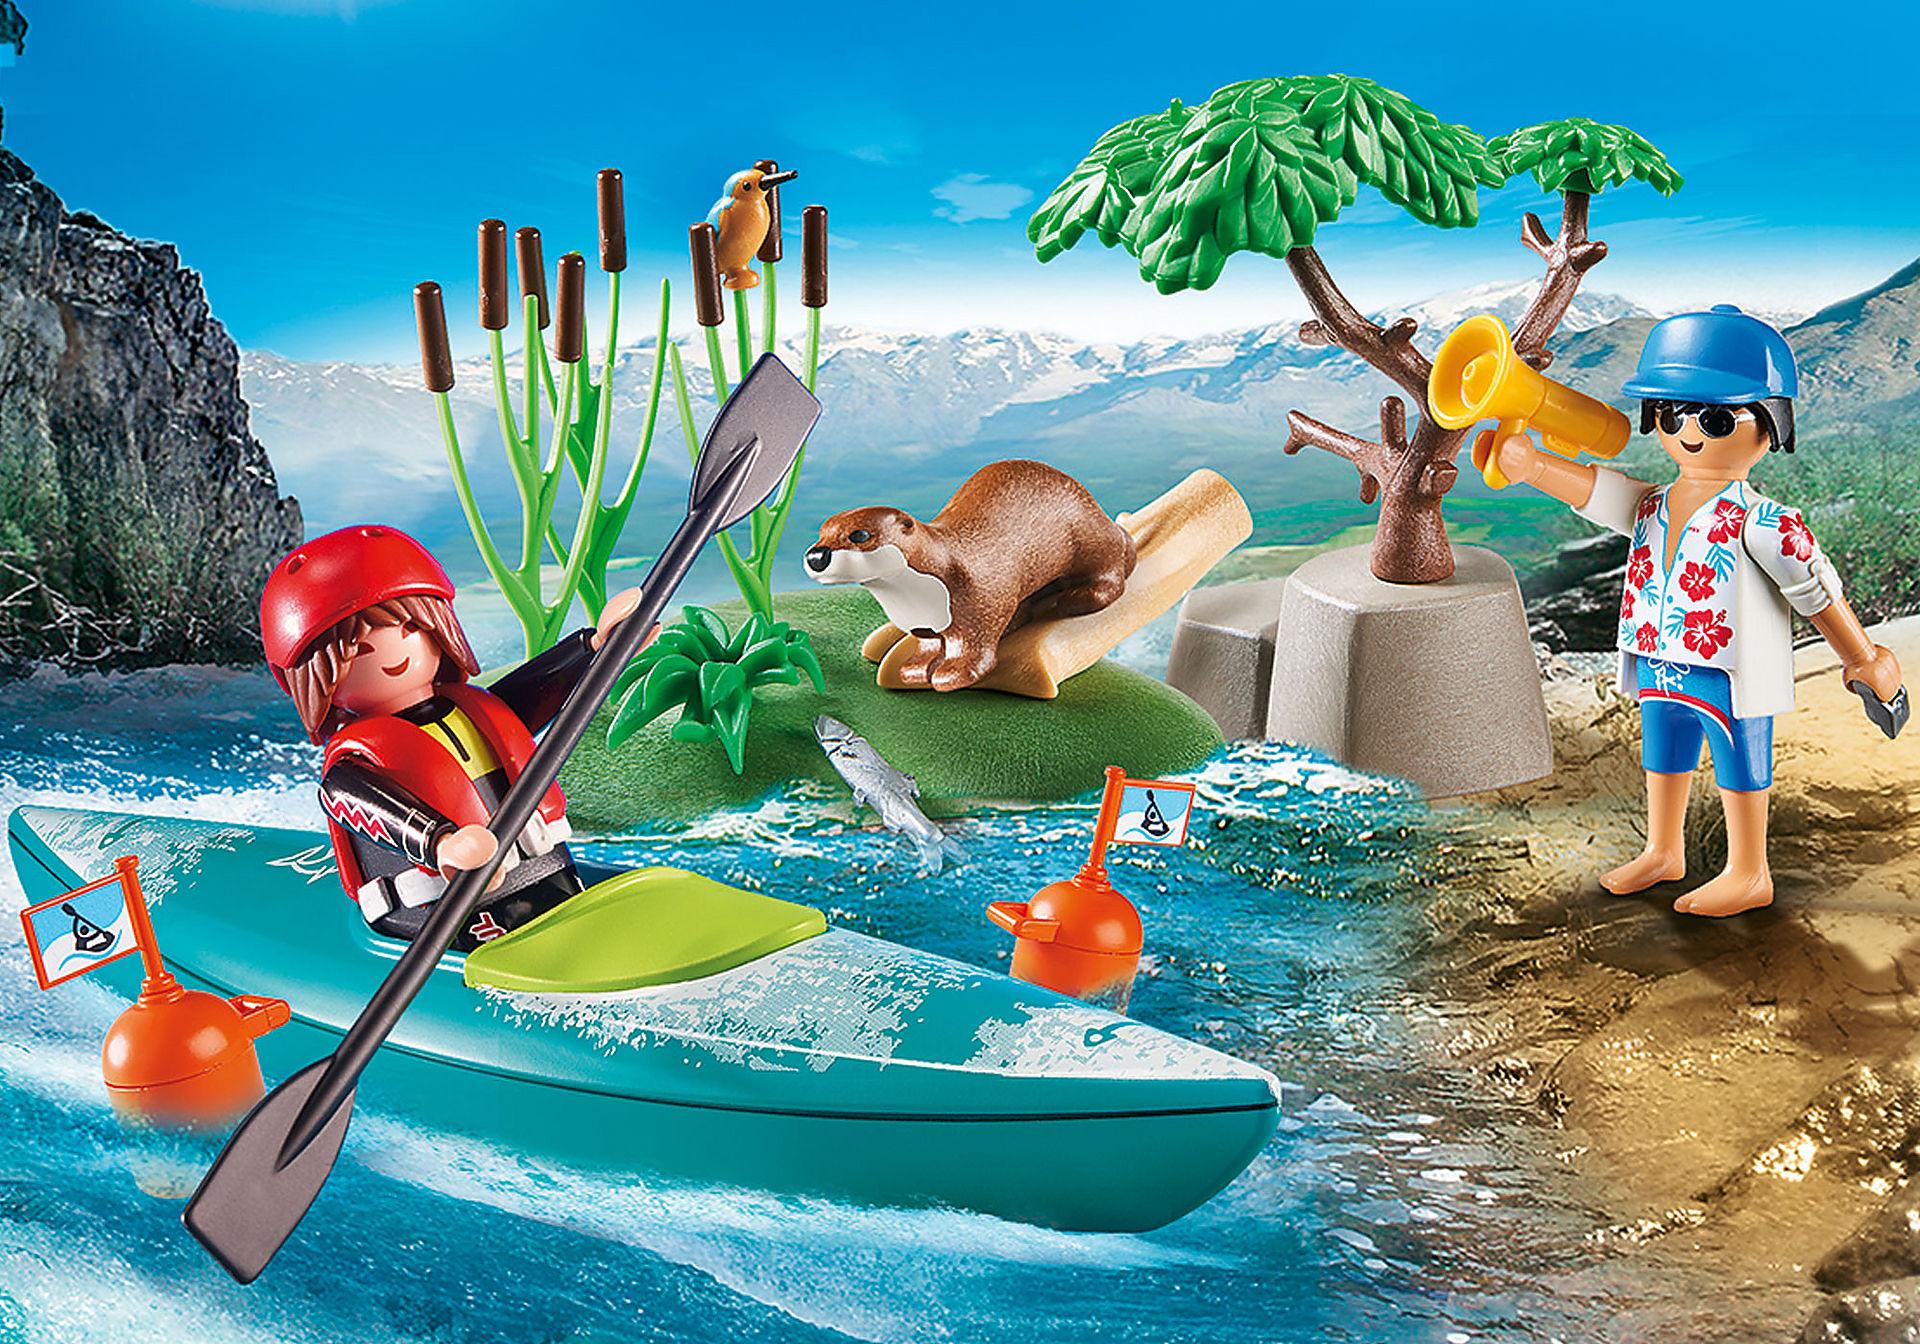 70035 Starter Park Kayak Adventure zoom image1